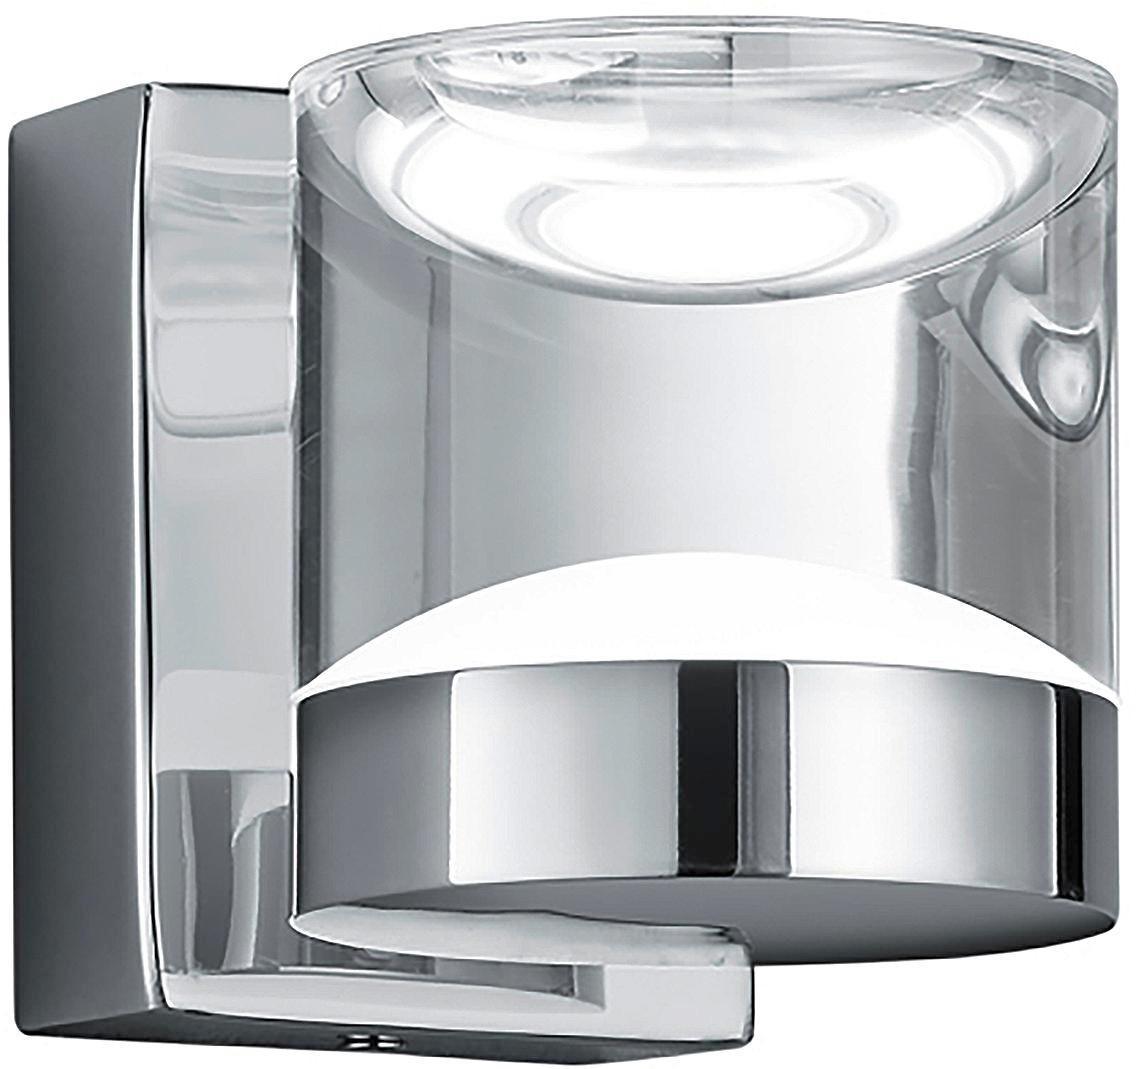 BADEZIMMER-WANDLEUCHTE - Chromfarben/Klar, Design, Kunststoff/Metall (10,0/8,5/12,5cm)